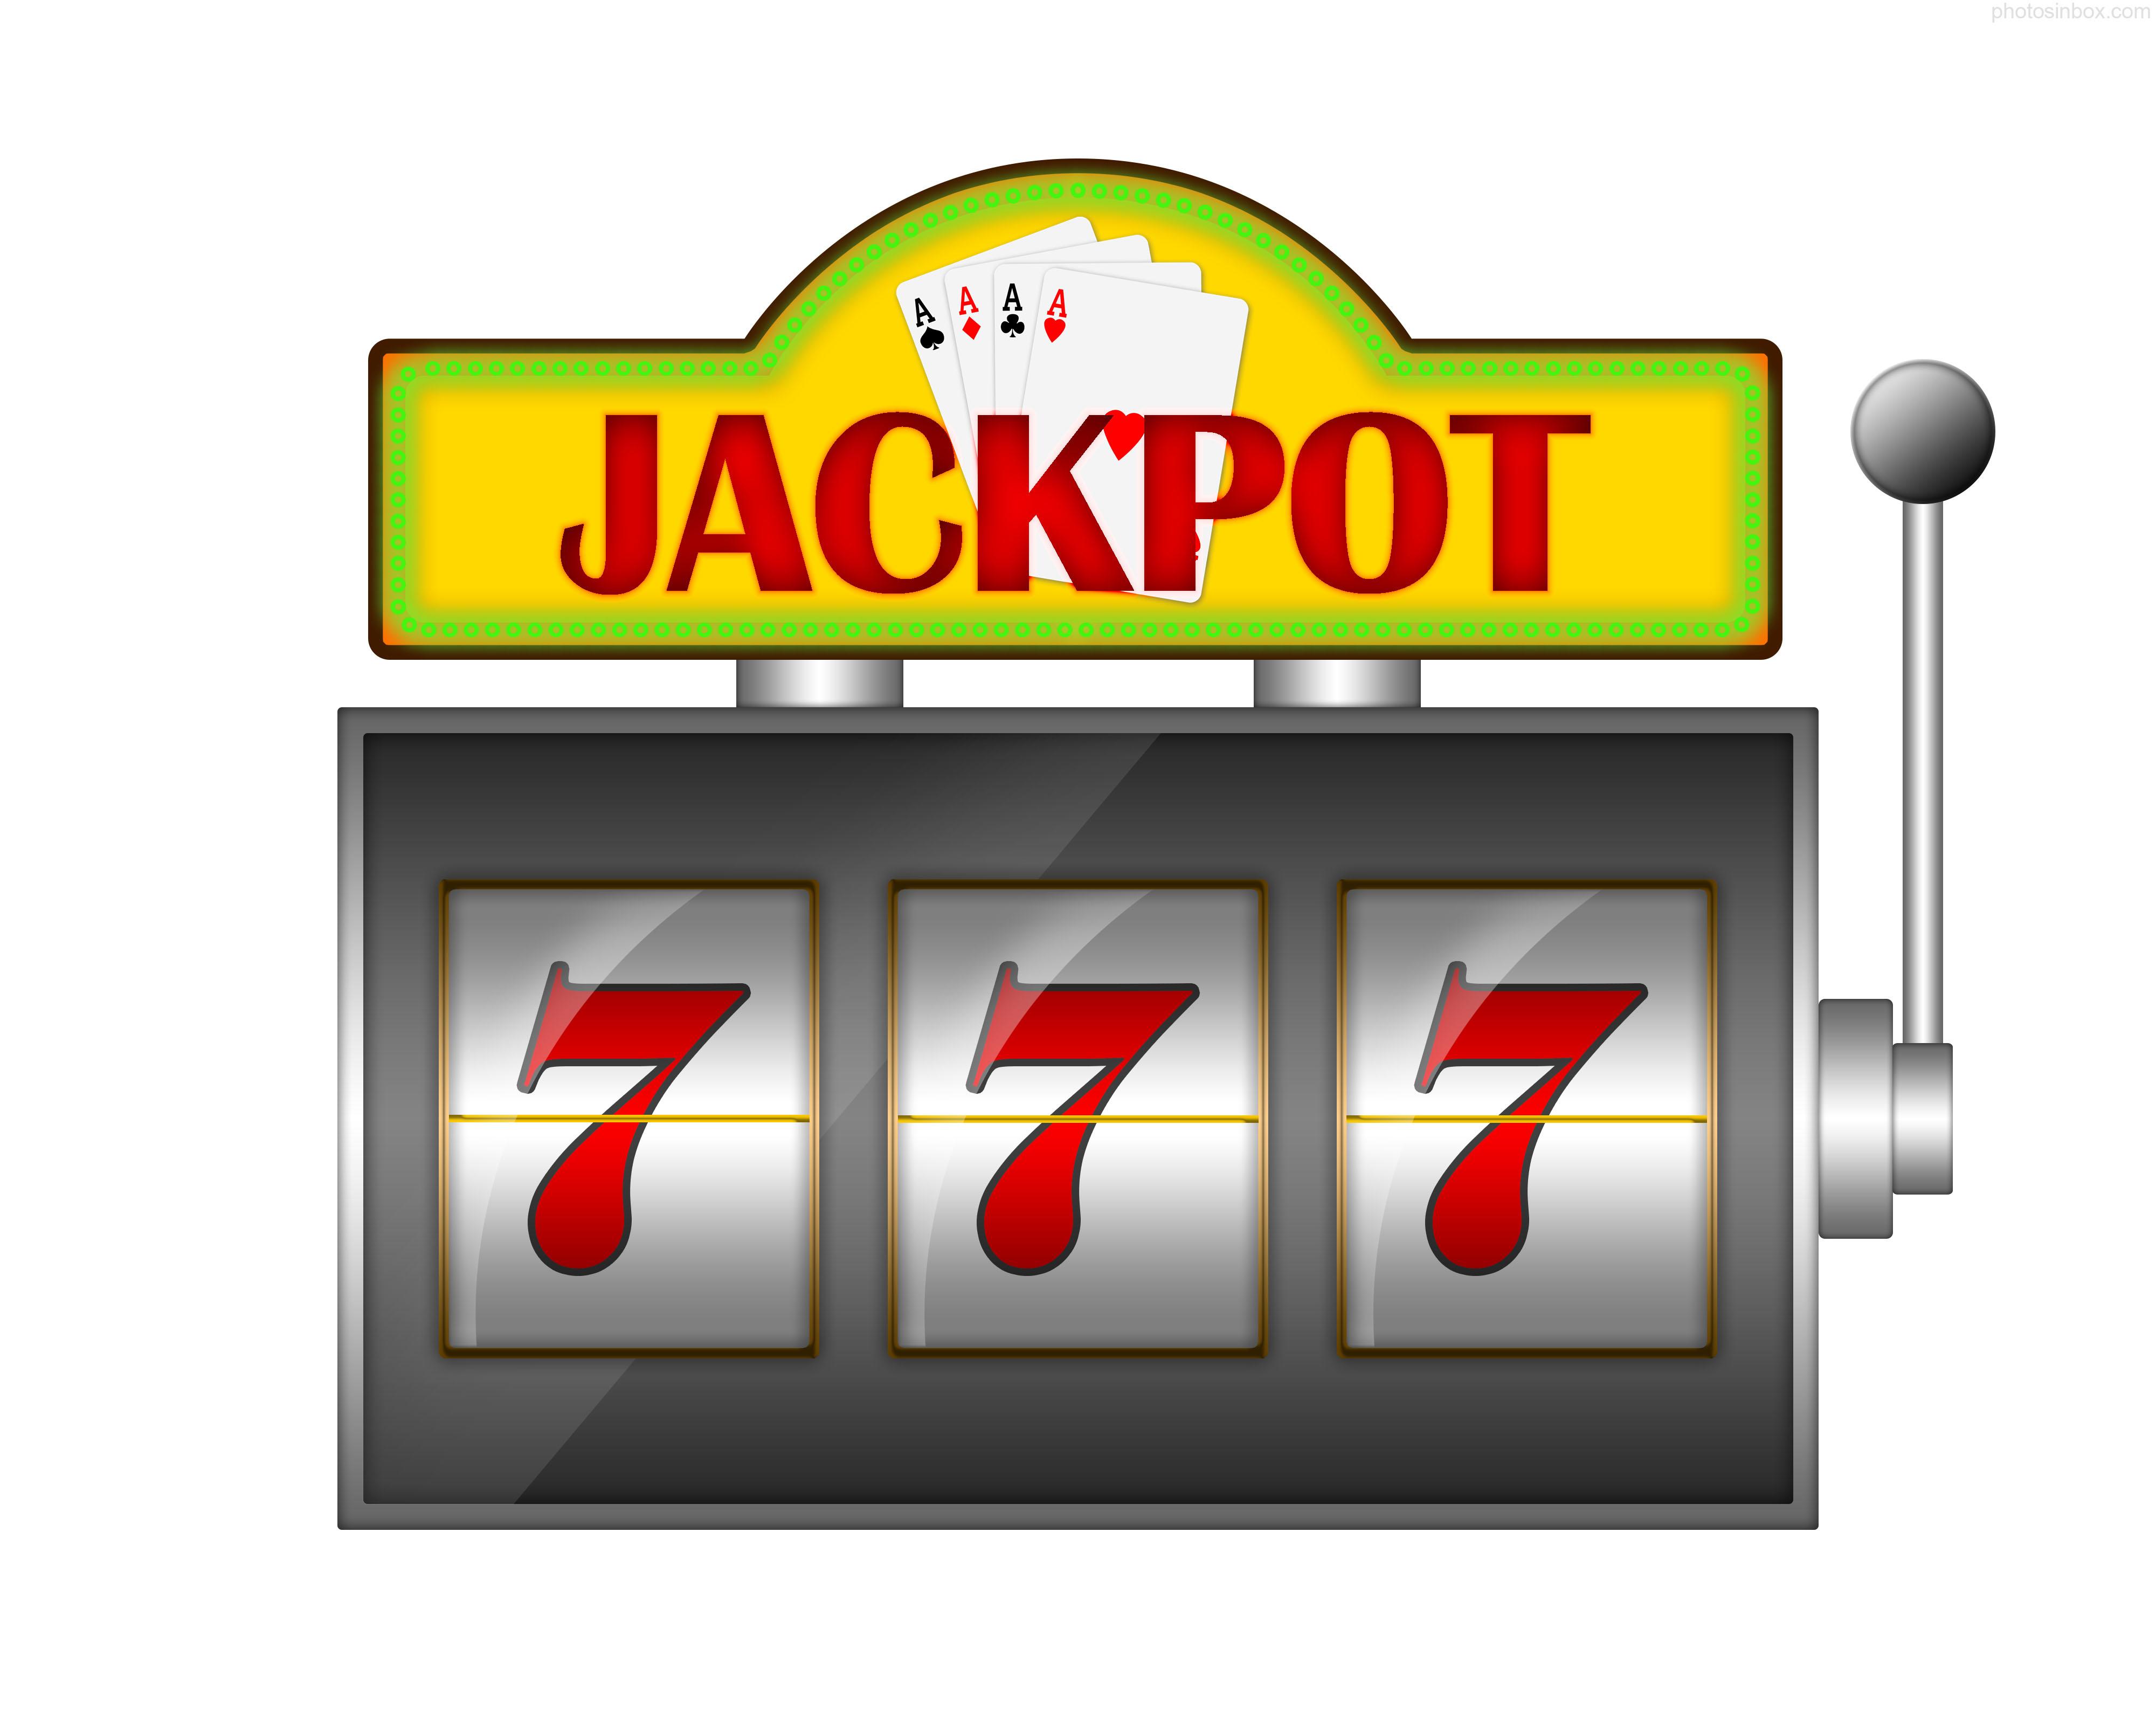 75 Casino Online-dan 777 pulsuz spins